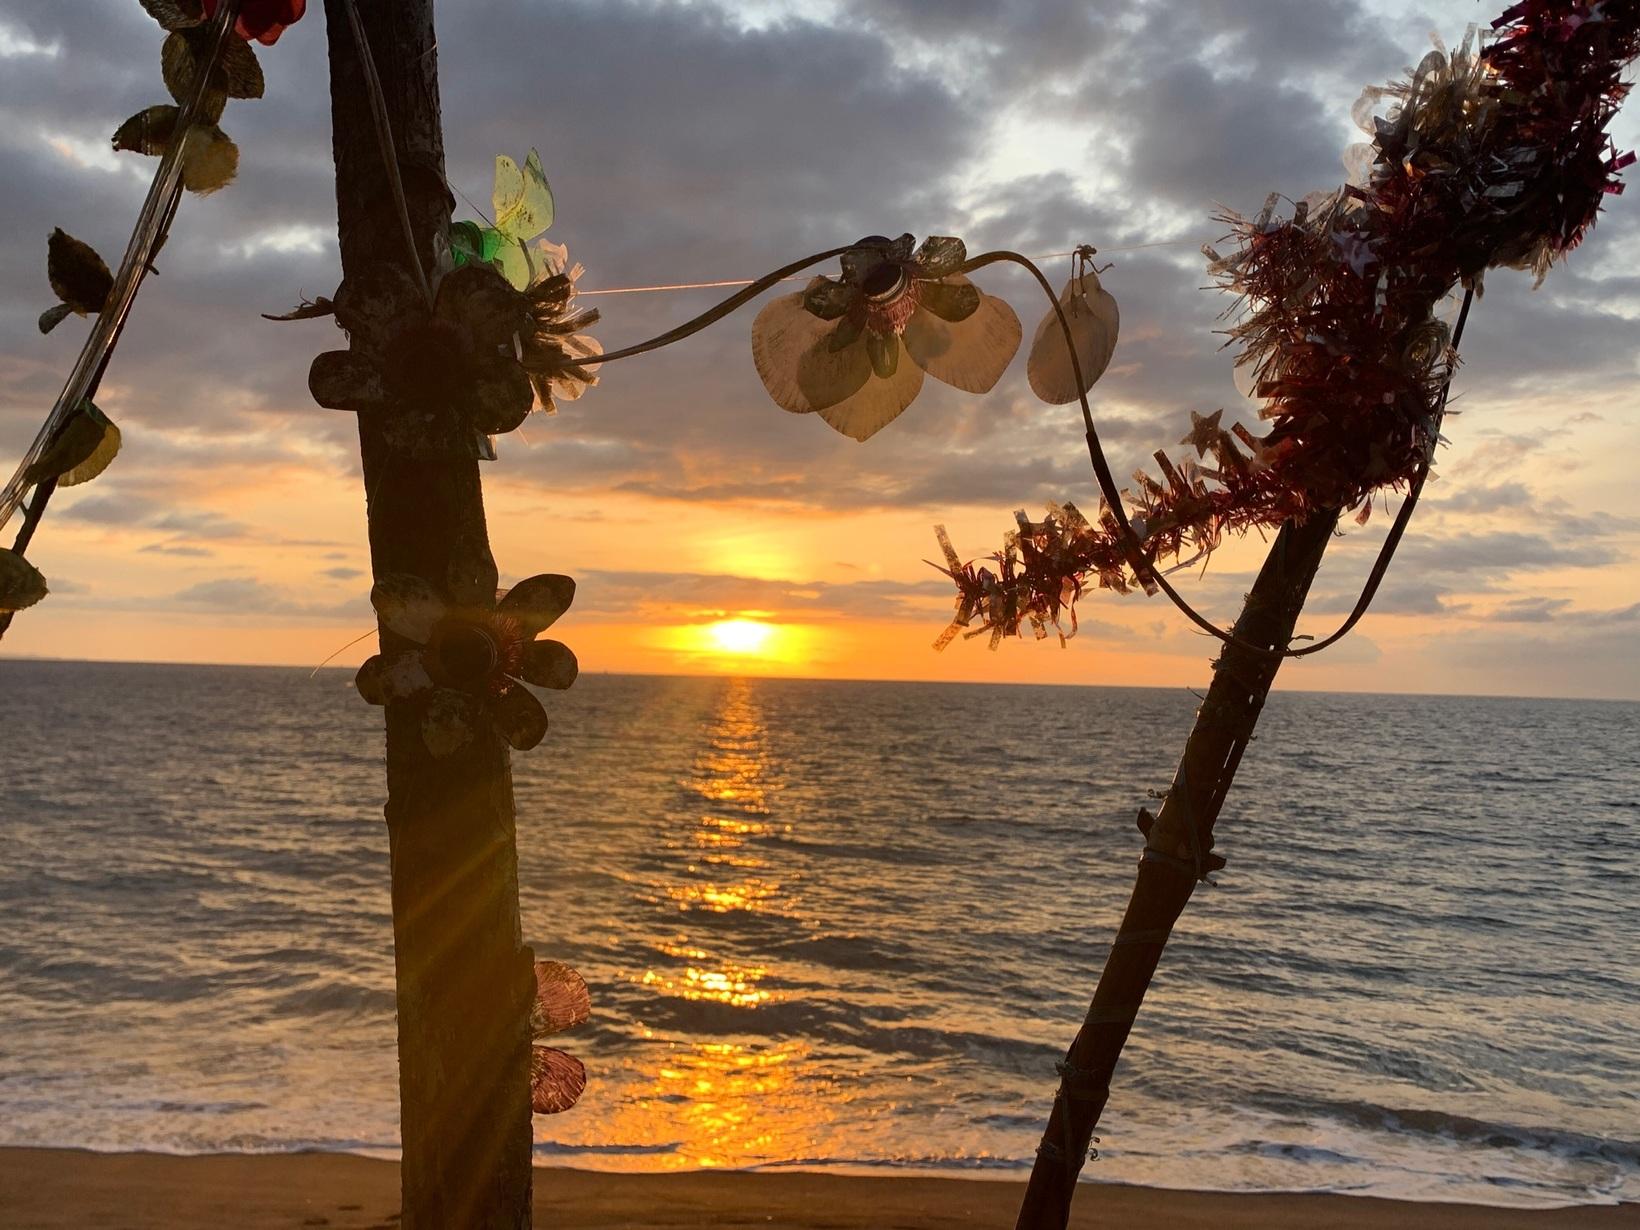 Lombok - Culture with a Beach!